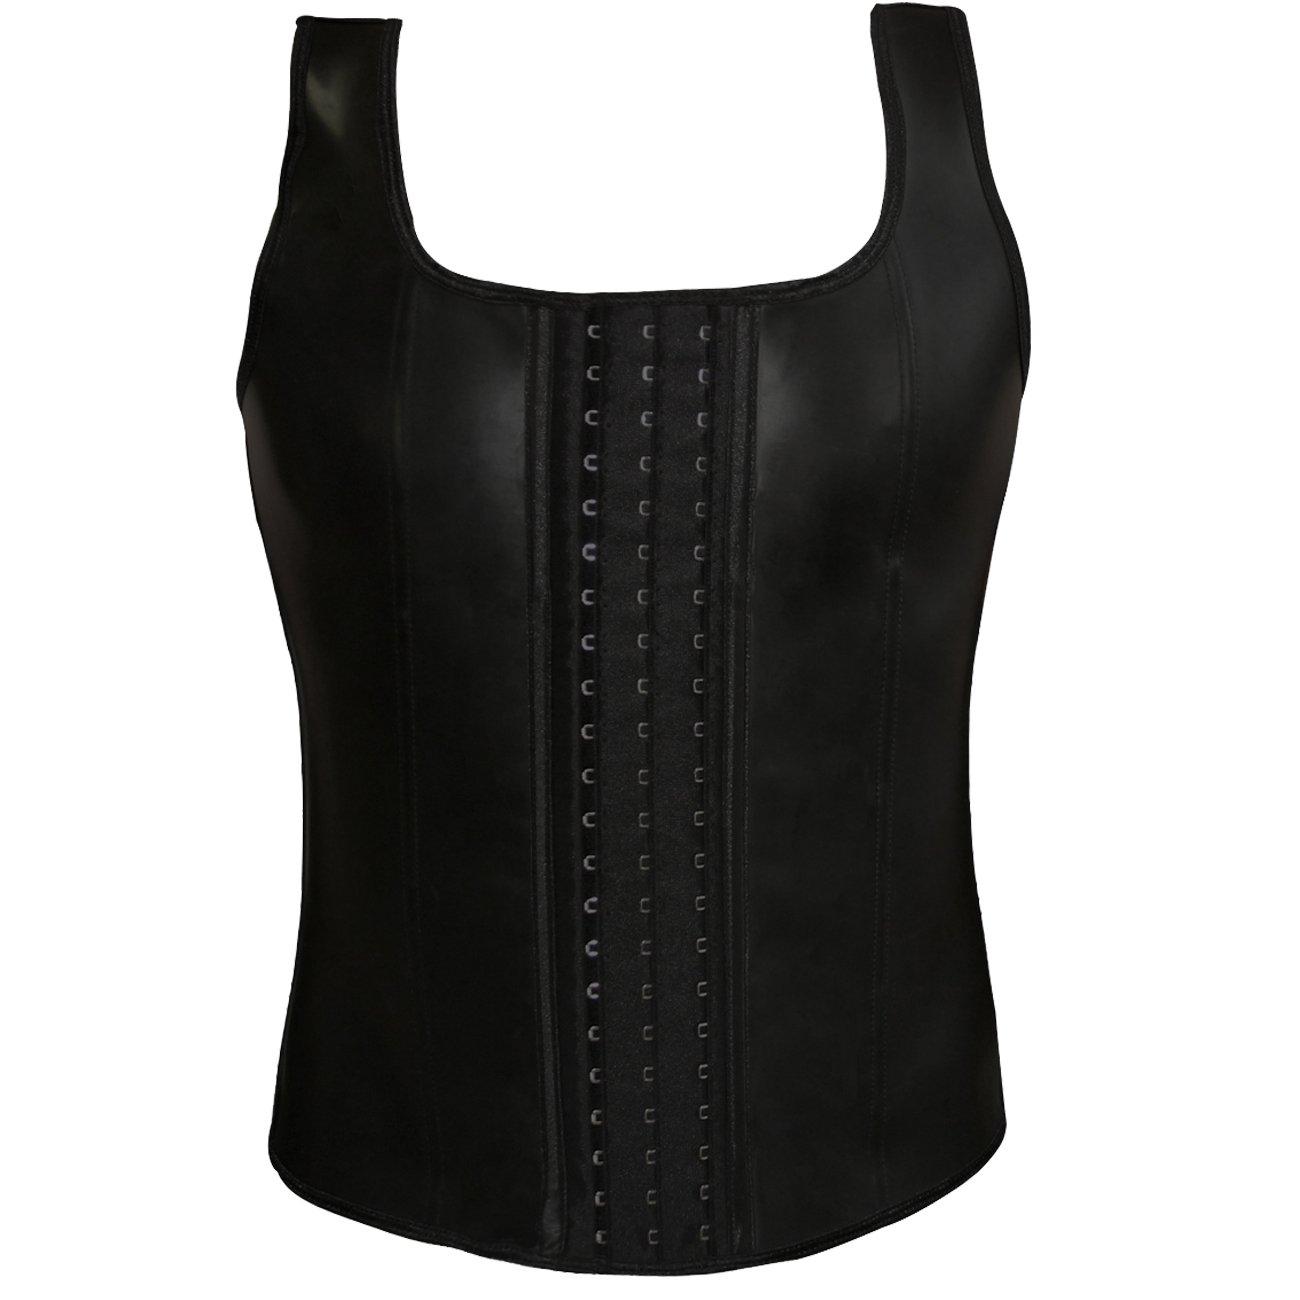 Men's Body Training Tank Top Latex Rubber Corset Vest Waist Shapewear ACME